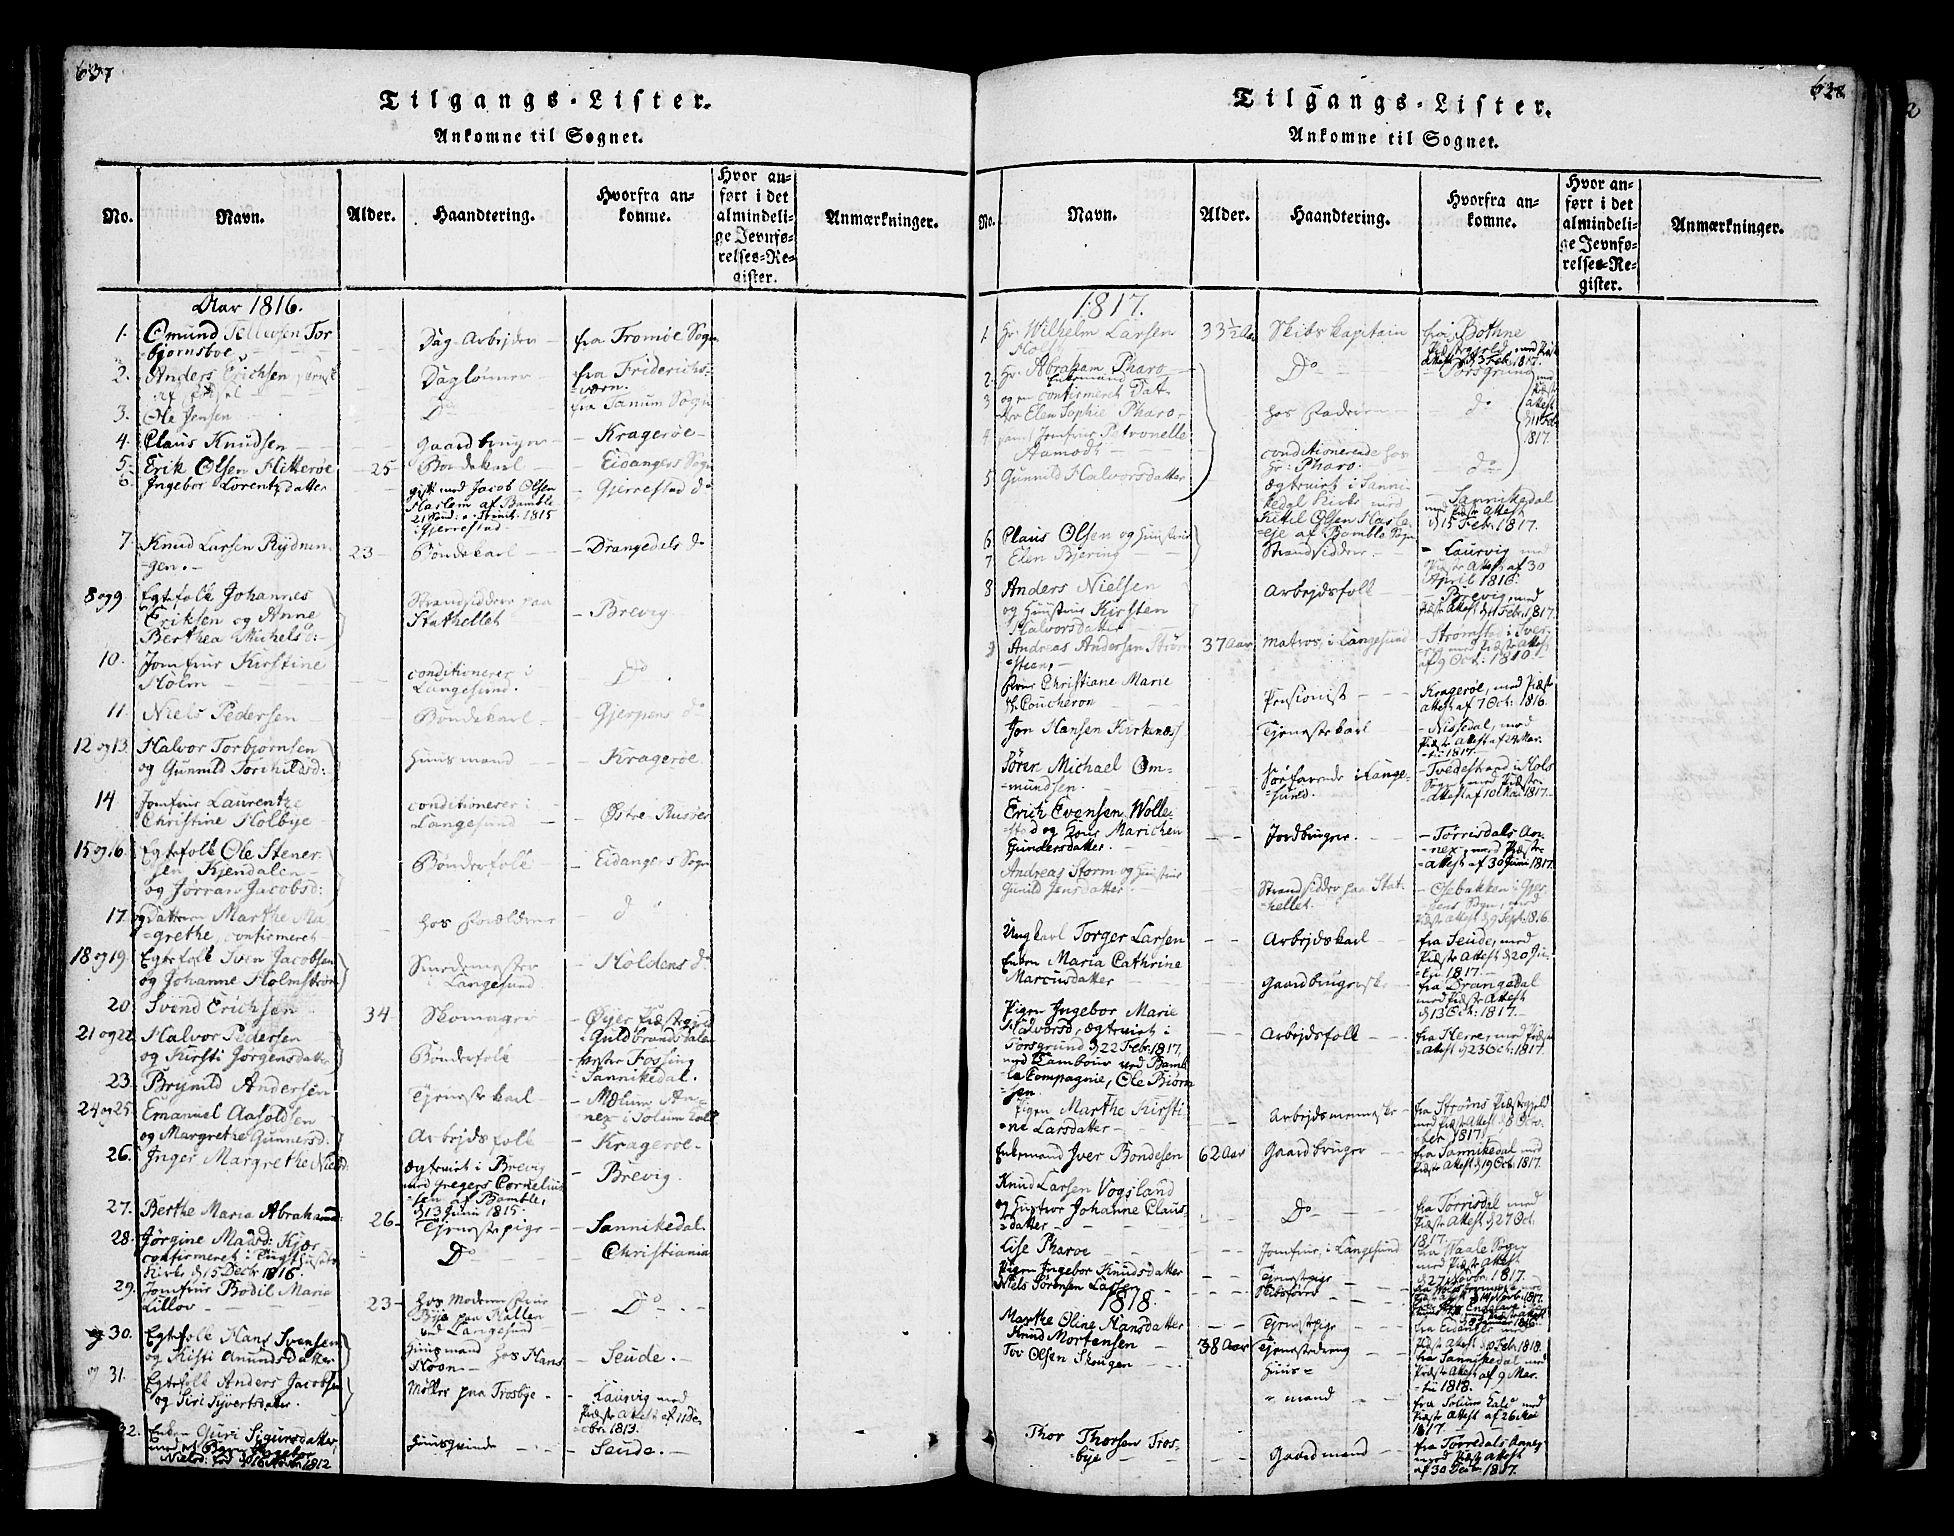 SAKO, Bamble kirkebøker, F/Fa/L0003: Ministerialbok nr. I 3 /1, 1814-1834, s. 637-638